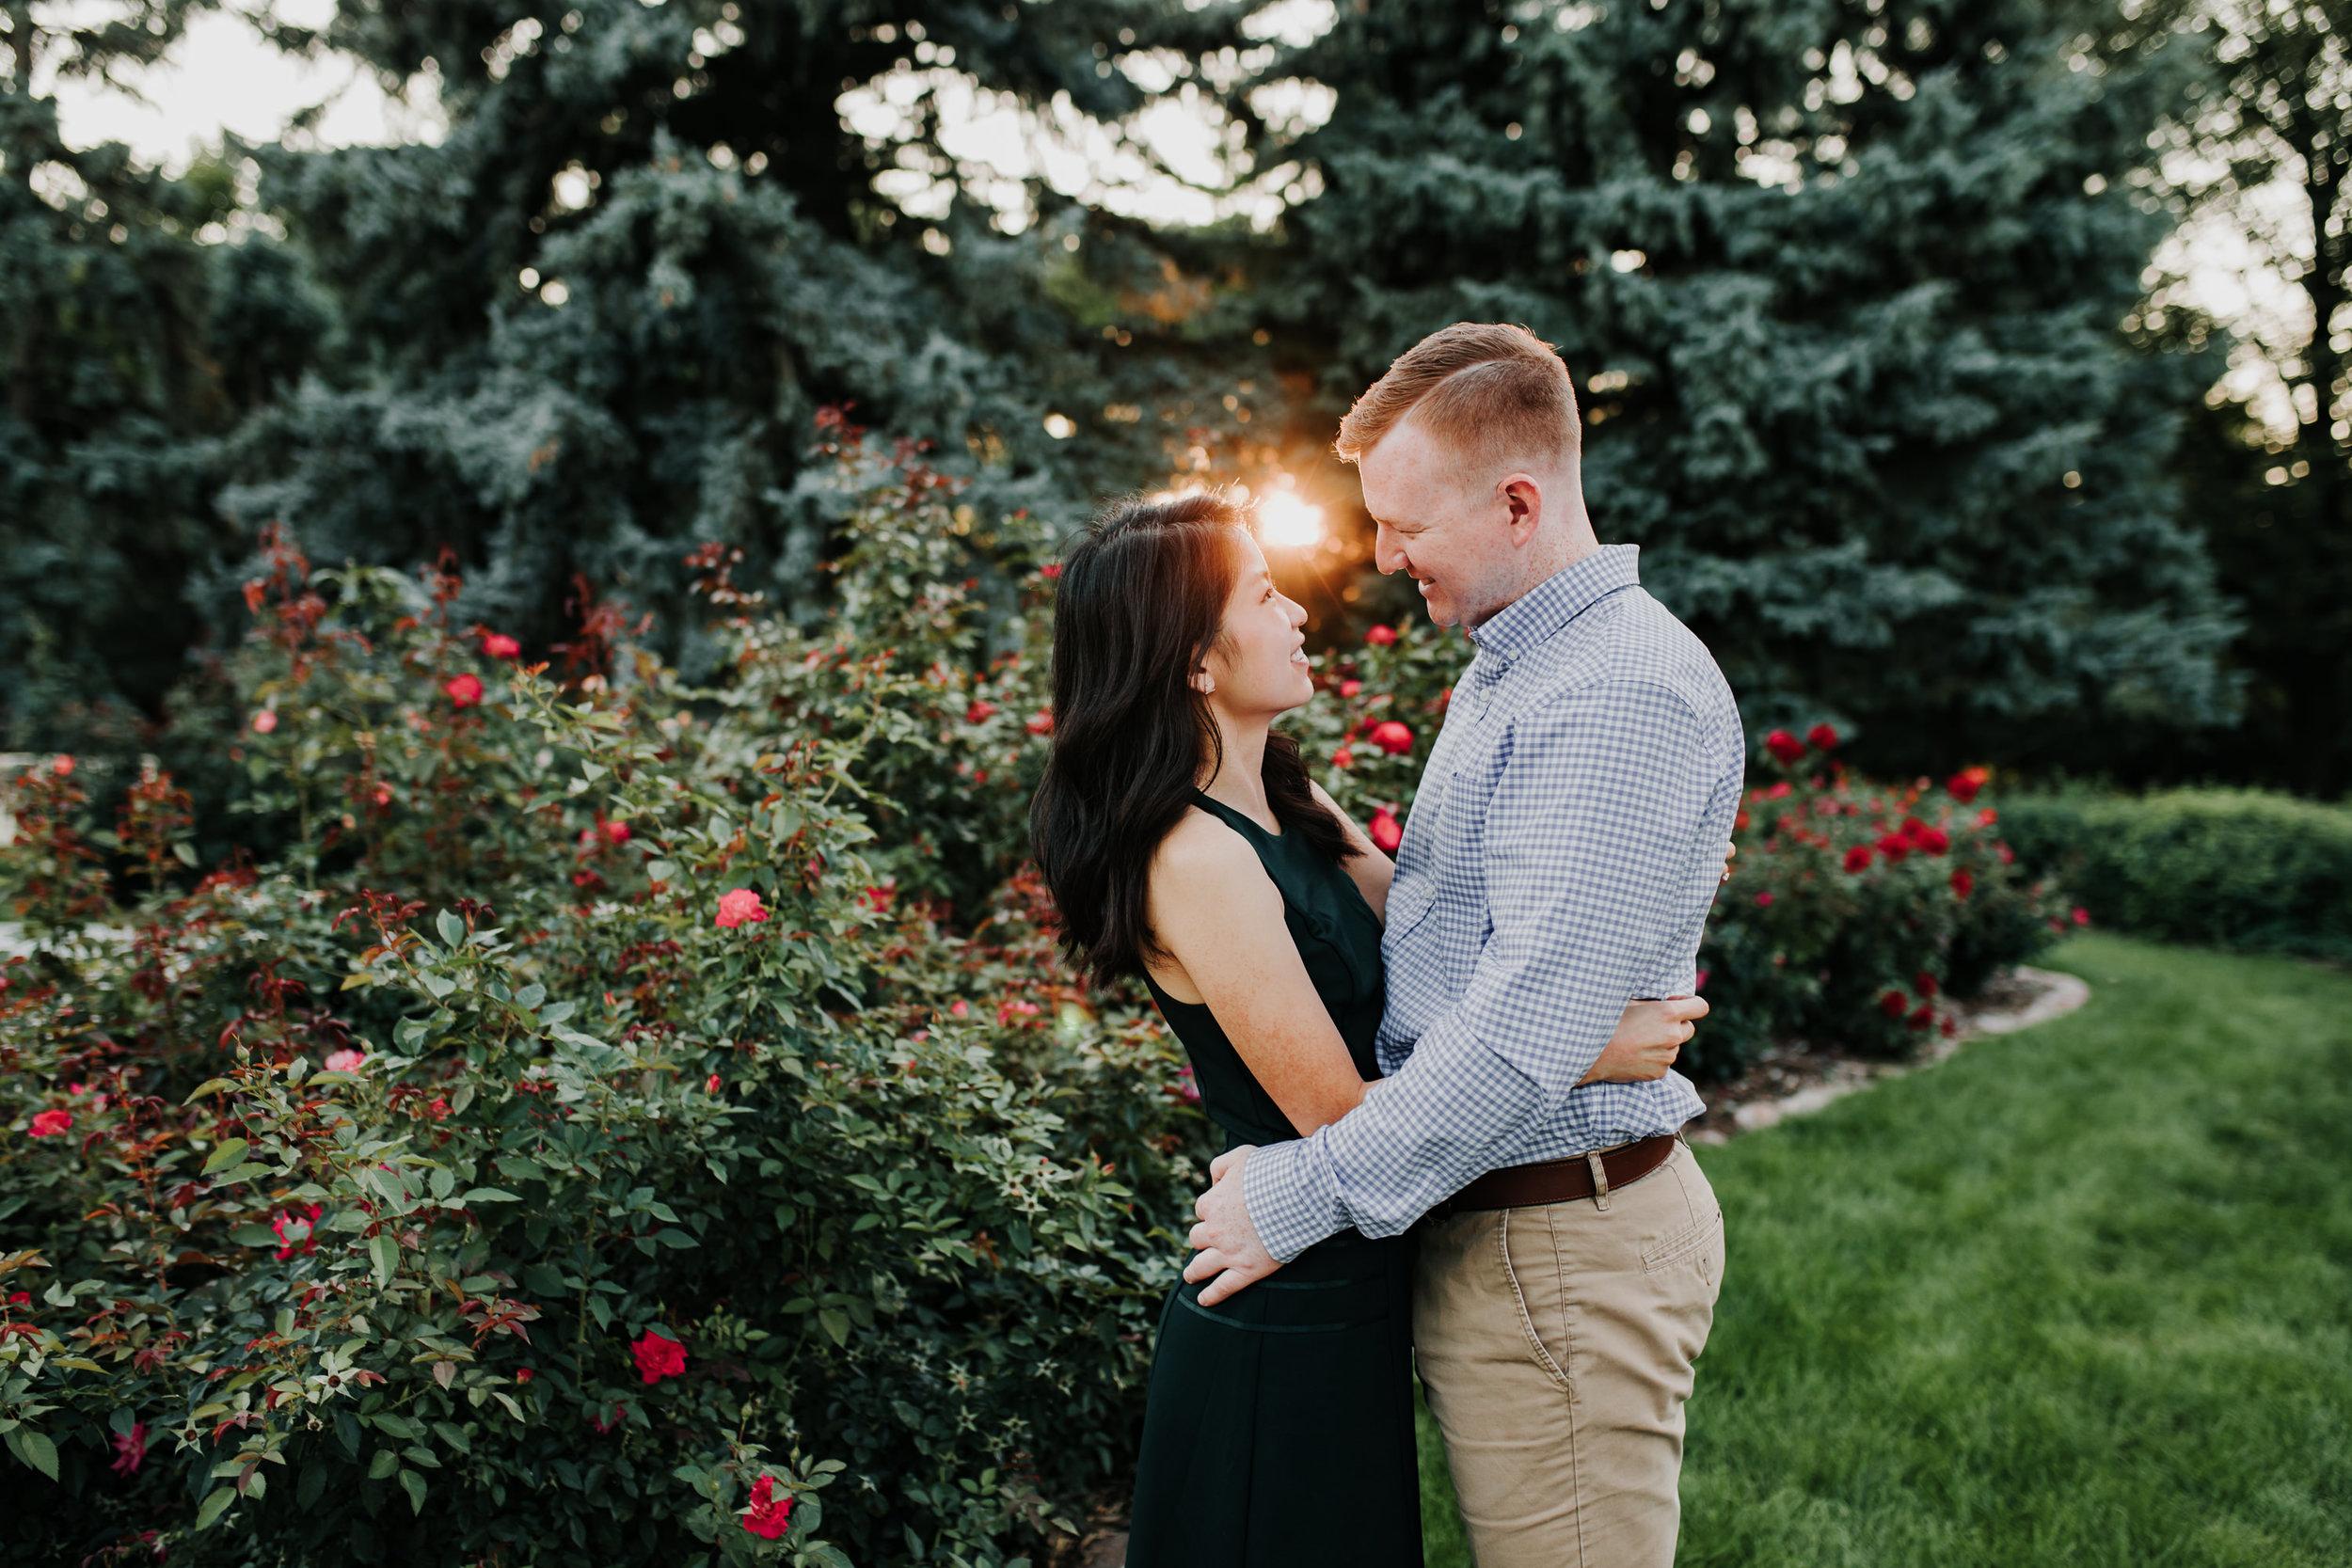 Catherin & Kyle - Married - Nathaniel Jensen Photography - Omaha Nebraska Wedding Photograper - Memorial Park - Joslyn Castle Engagement Session-55.jpg